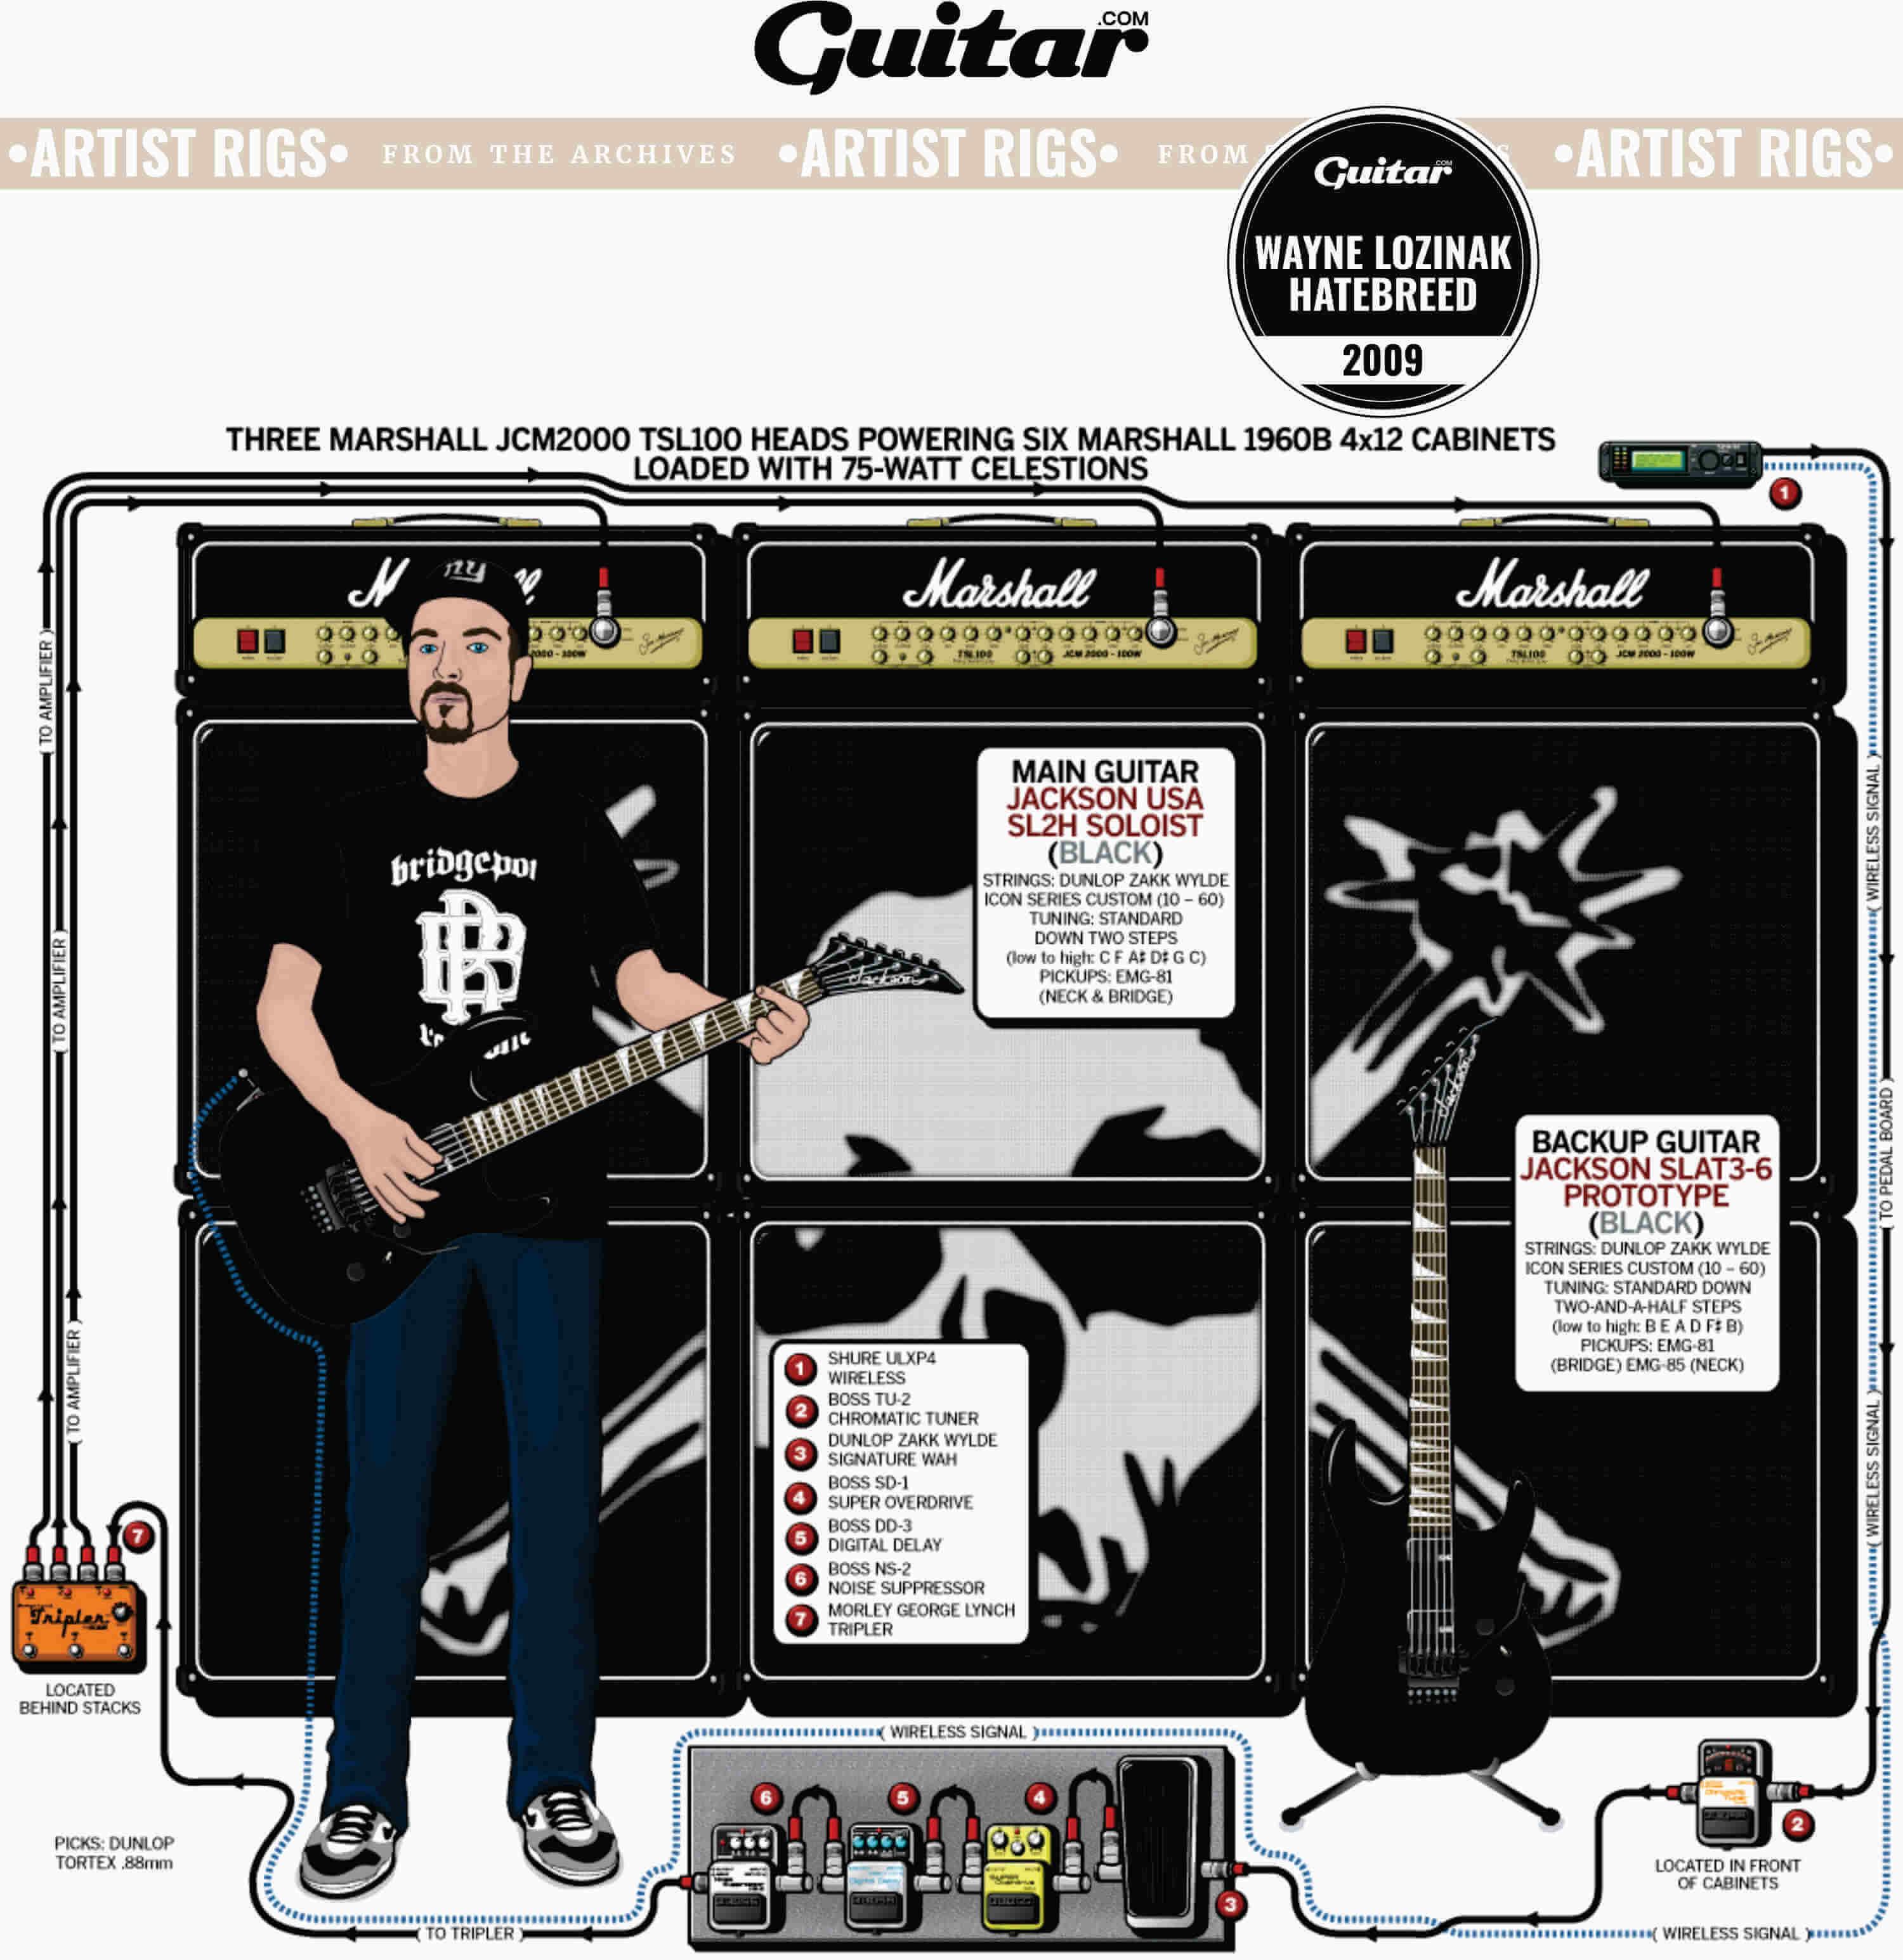 Rig Diagram: Wayne Lozinak, Hatebreed (2009)